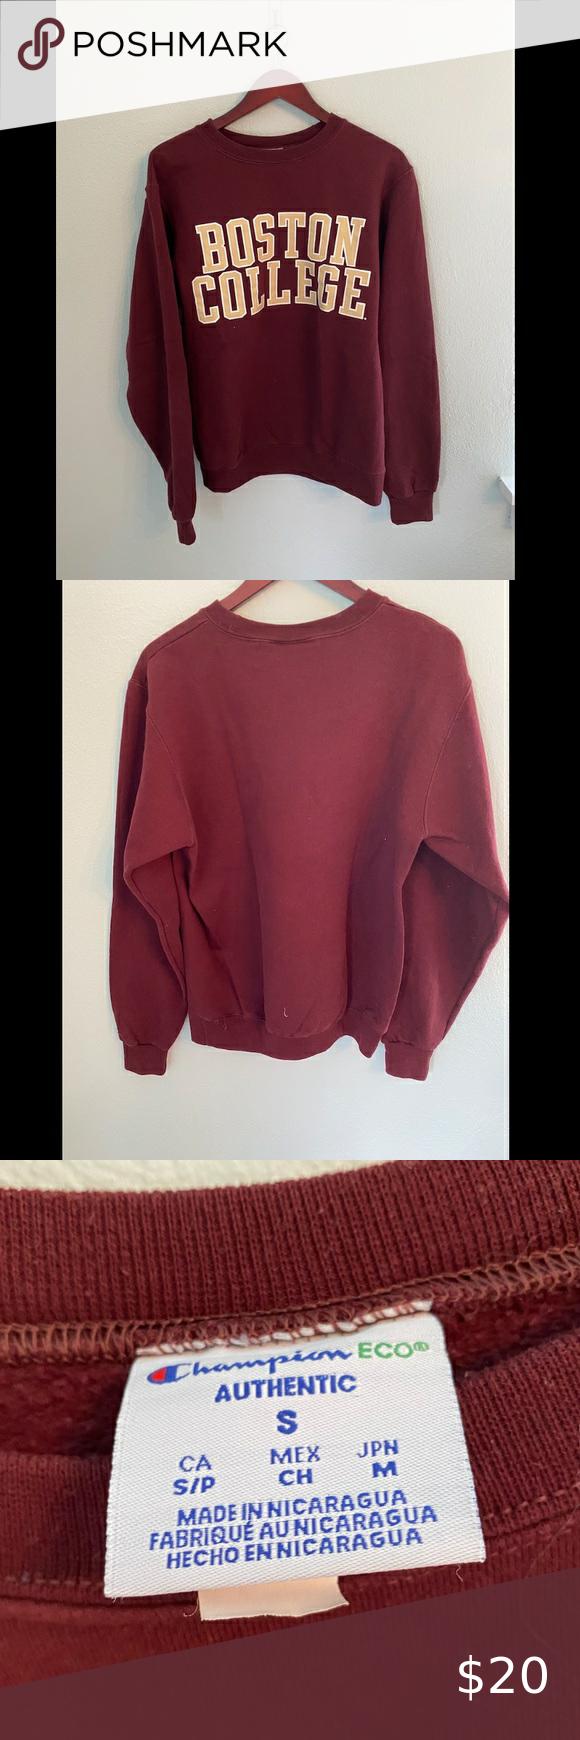 Champion Boston College Sweatshirt Sweatshirts College Sweatshirt Sweatshirt Tops [ 1740 x 580 Pixel ]